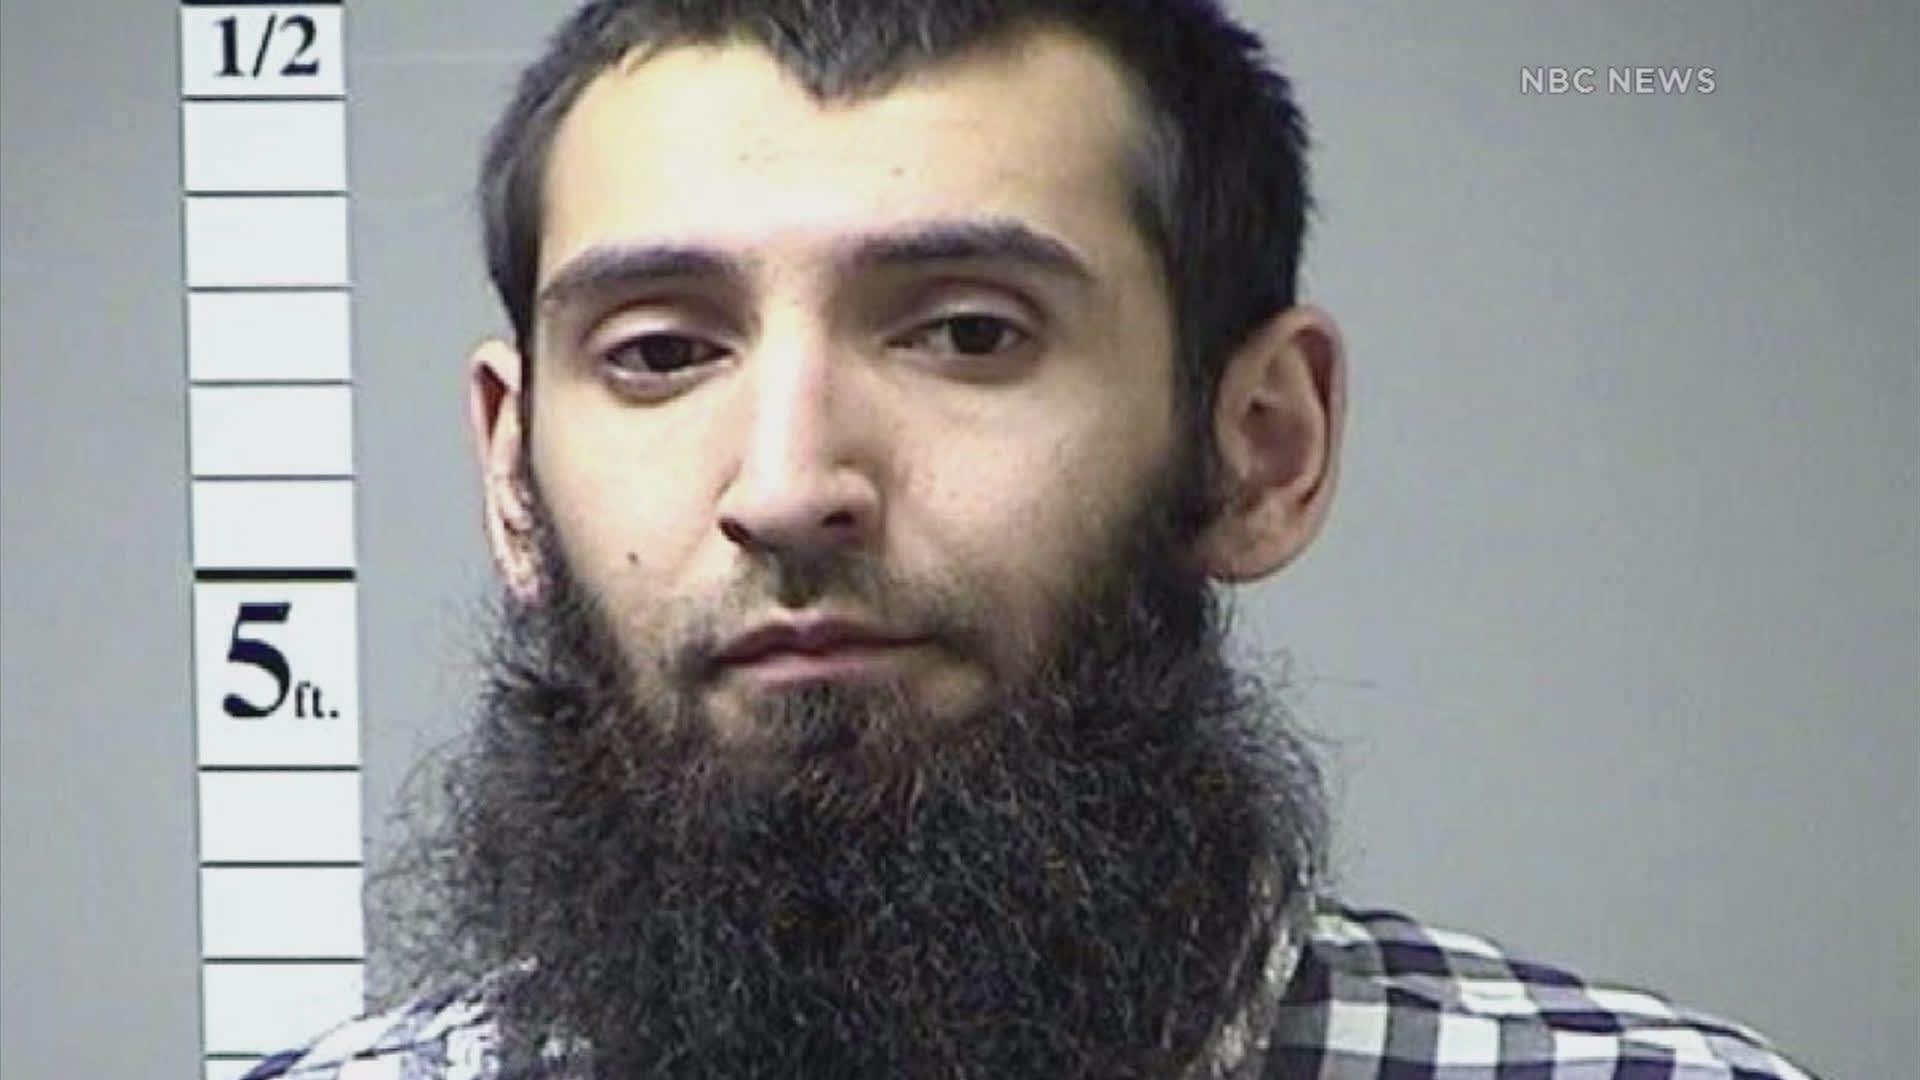 Suspect in New York Sayfullo Habibullaevic Saipov